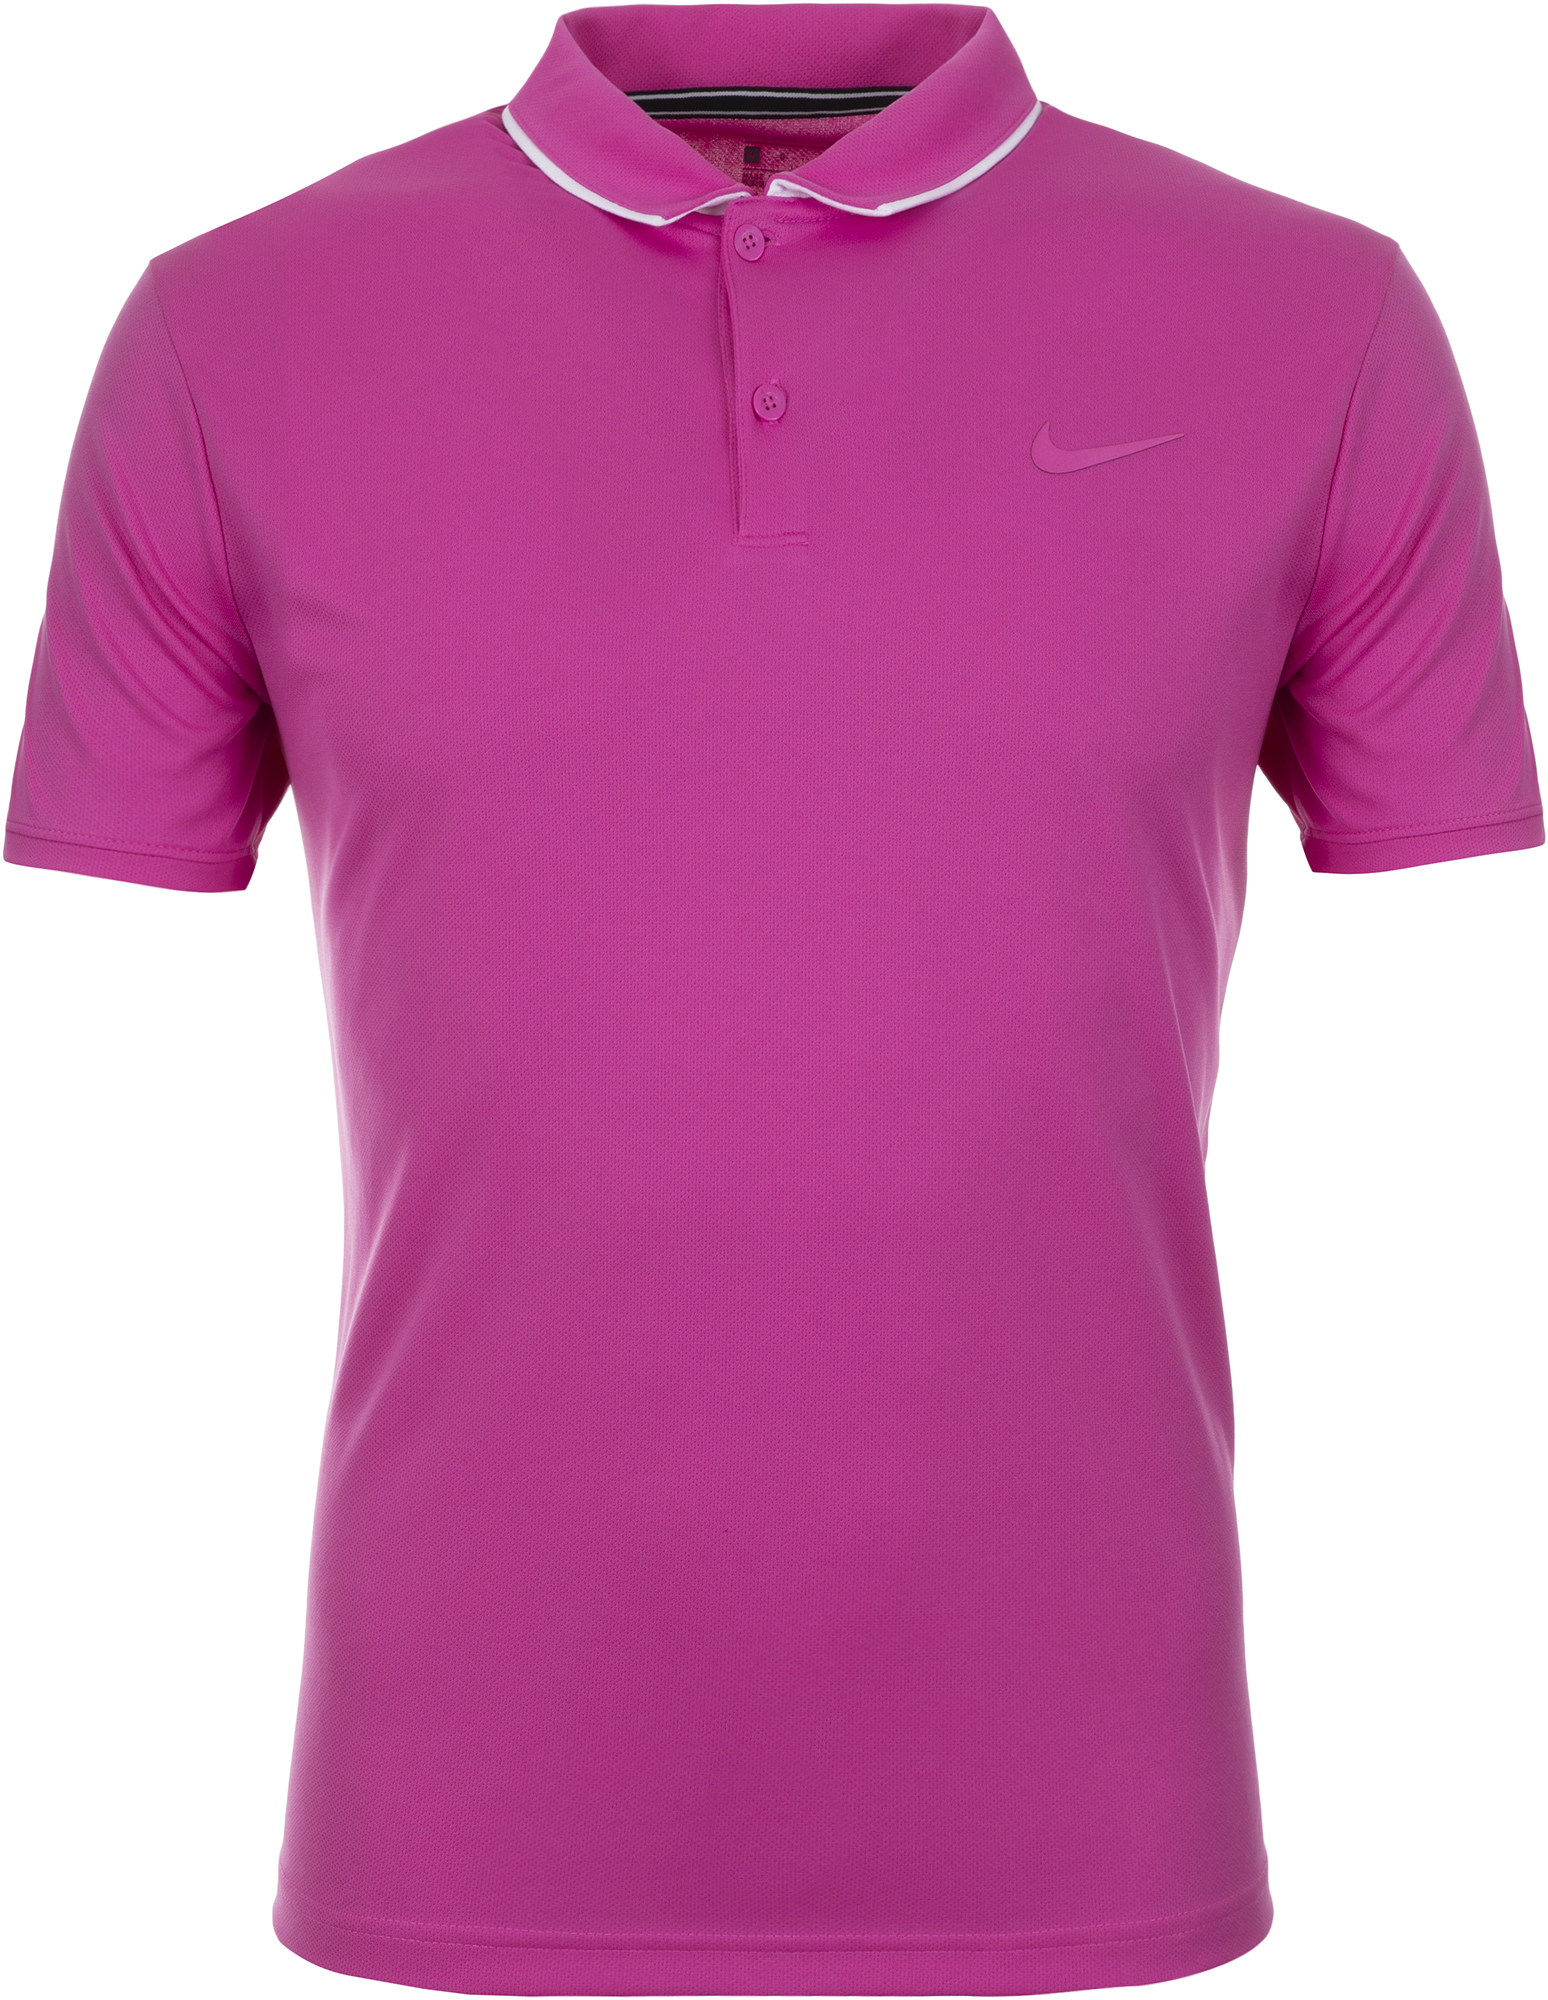 Nike Поло мужское Nike Dry, размер 44-46 поло мужское tom farr цвет черный tf 4000 58 19 размер s 46